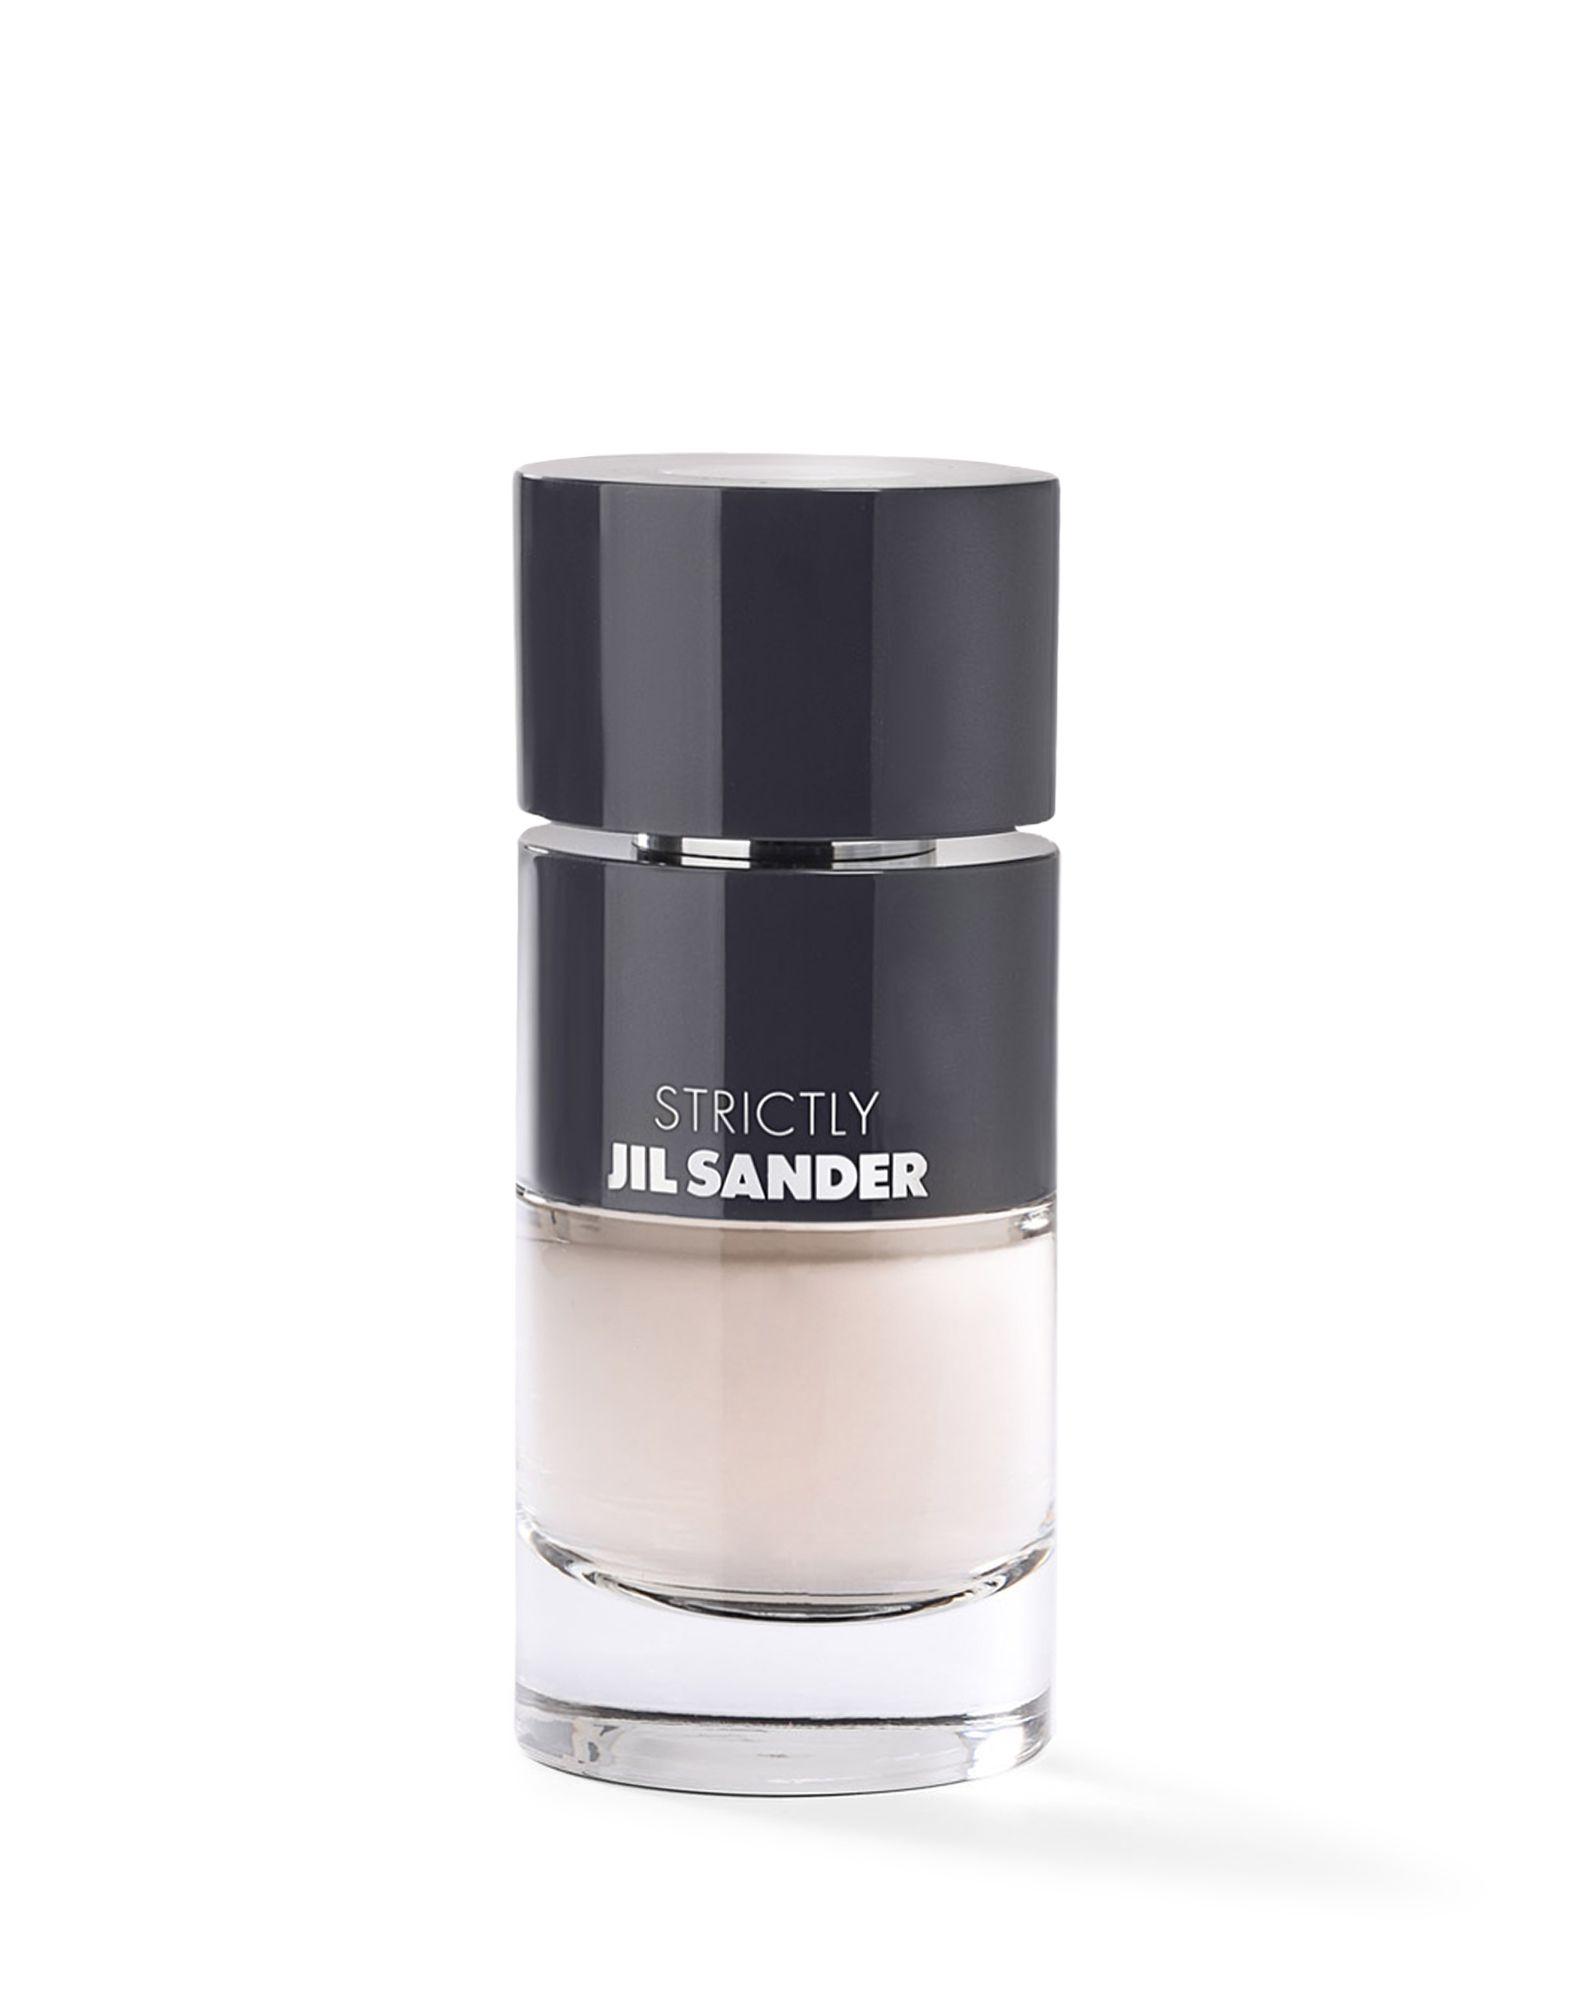 STRICTLY - JIL SANDER Online Store